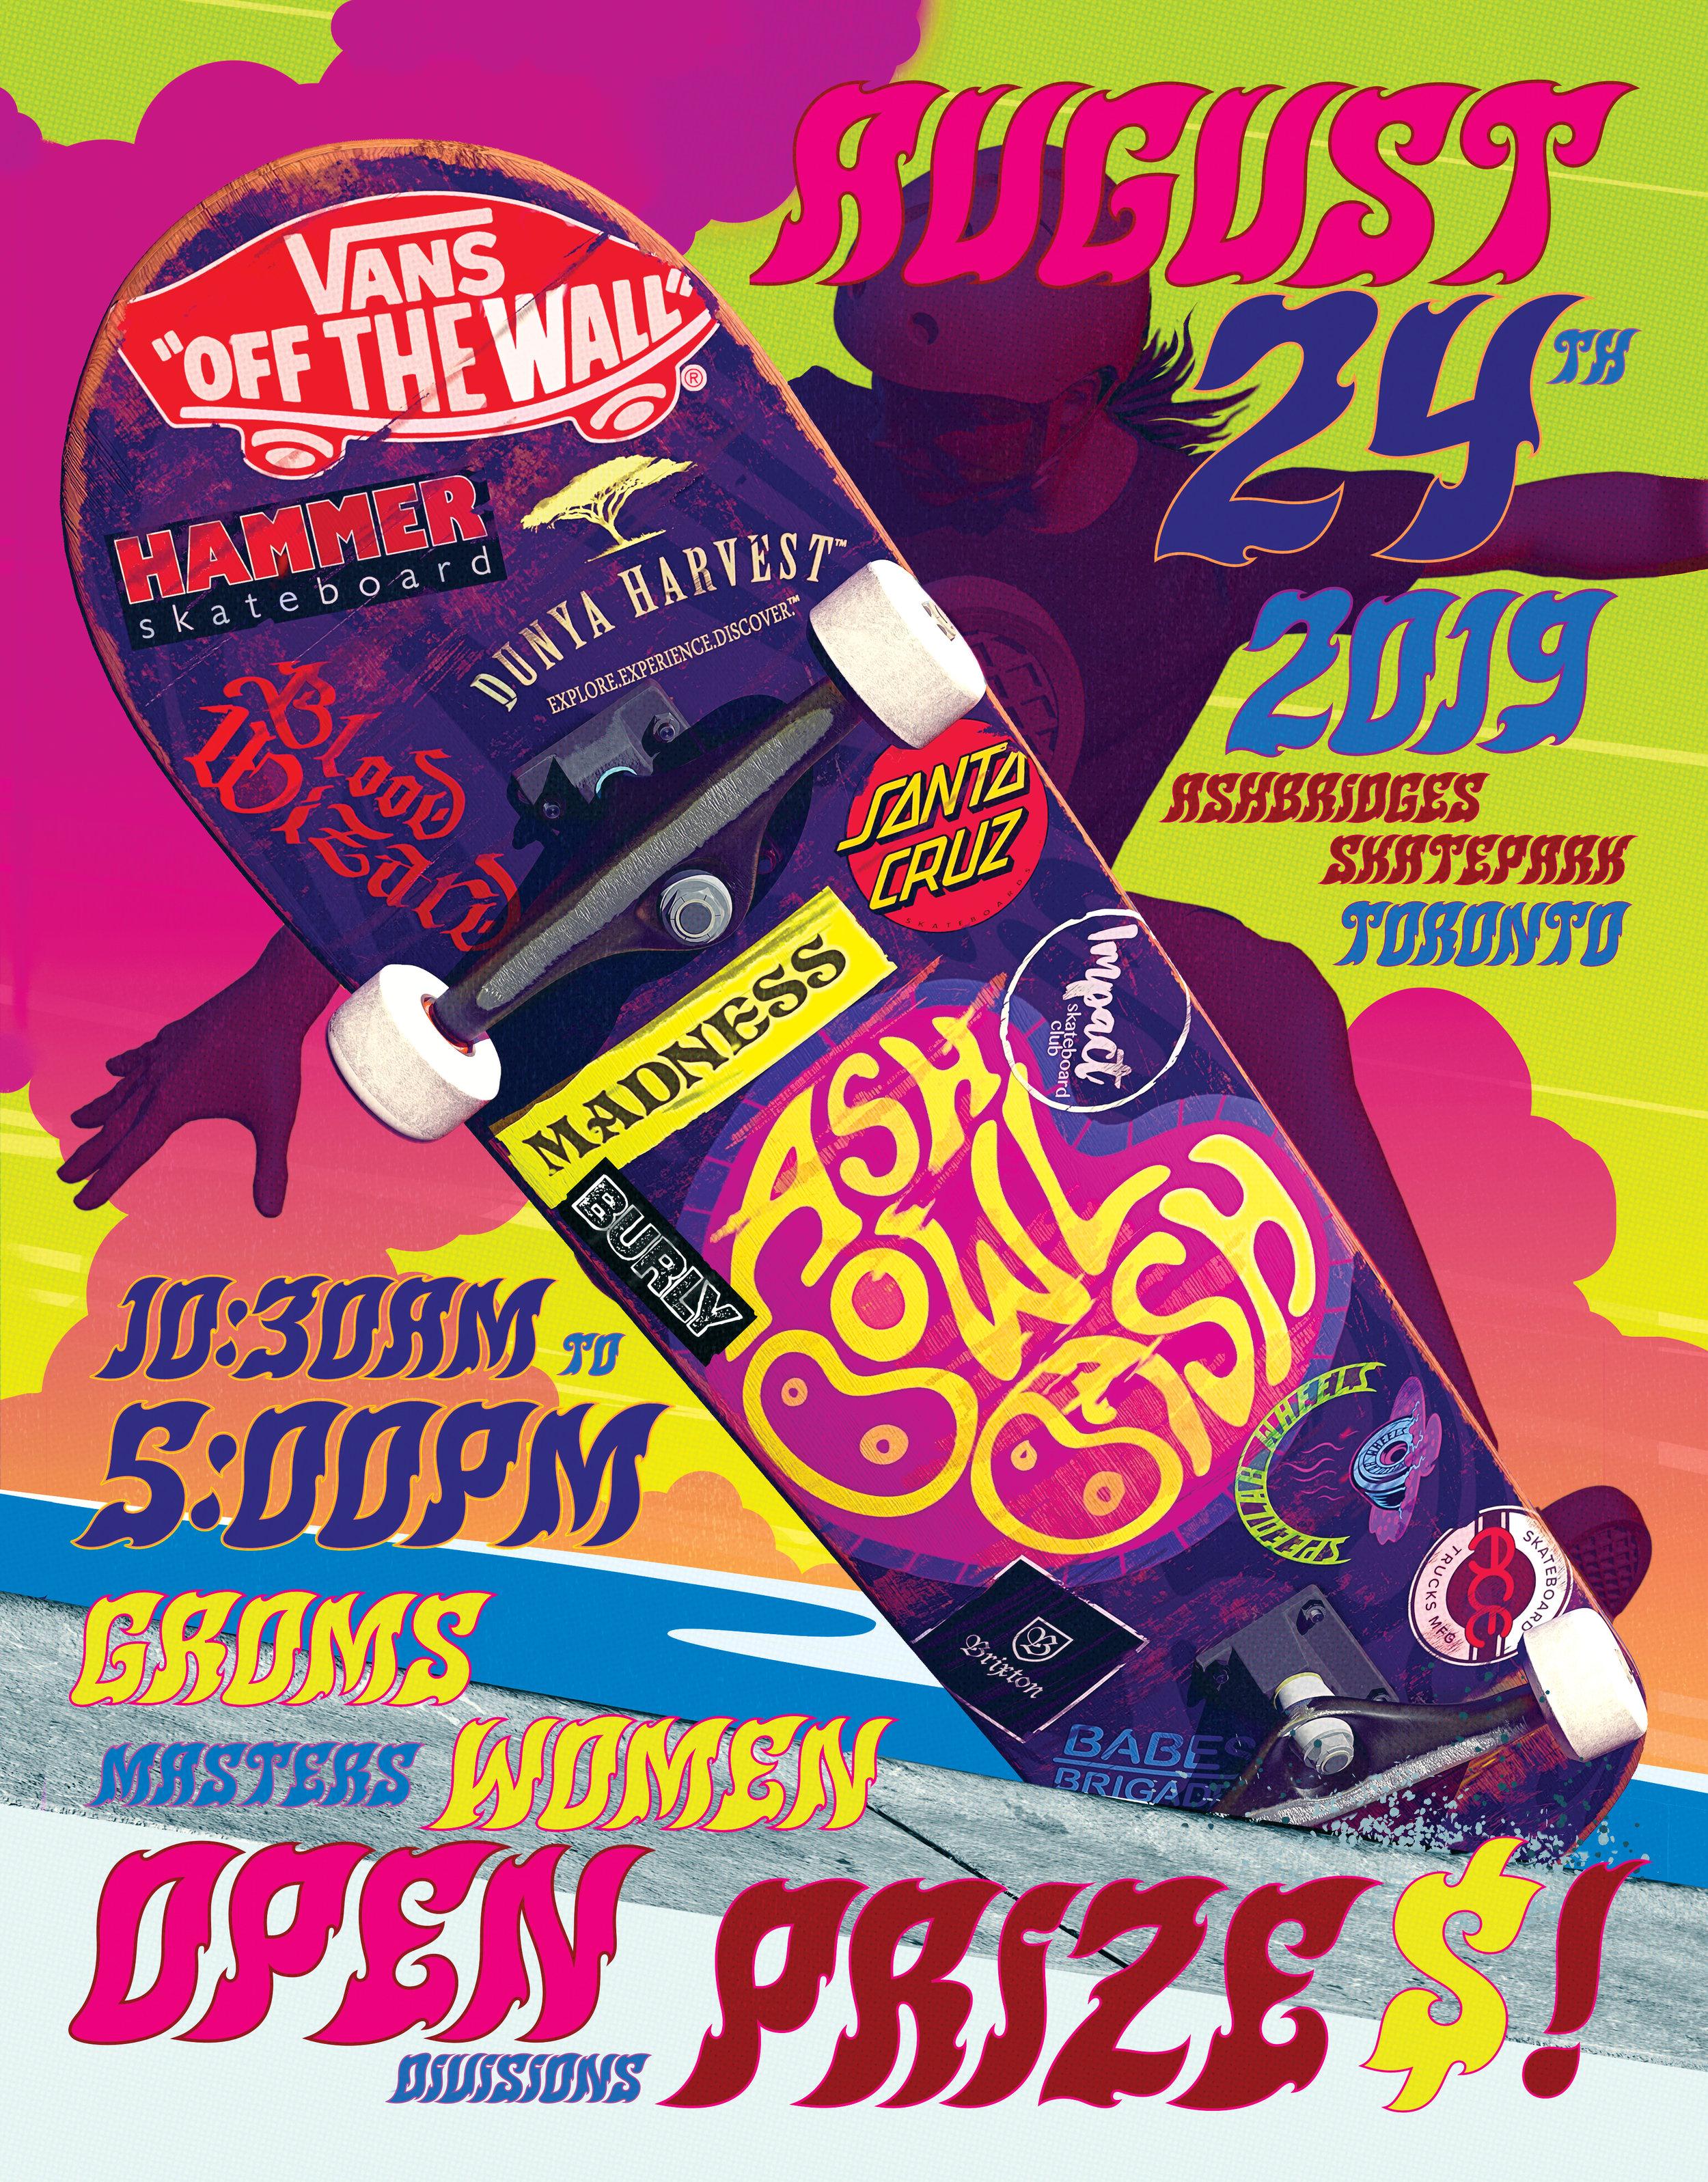 2019 Ash Bowl Bash poster.